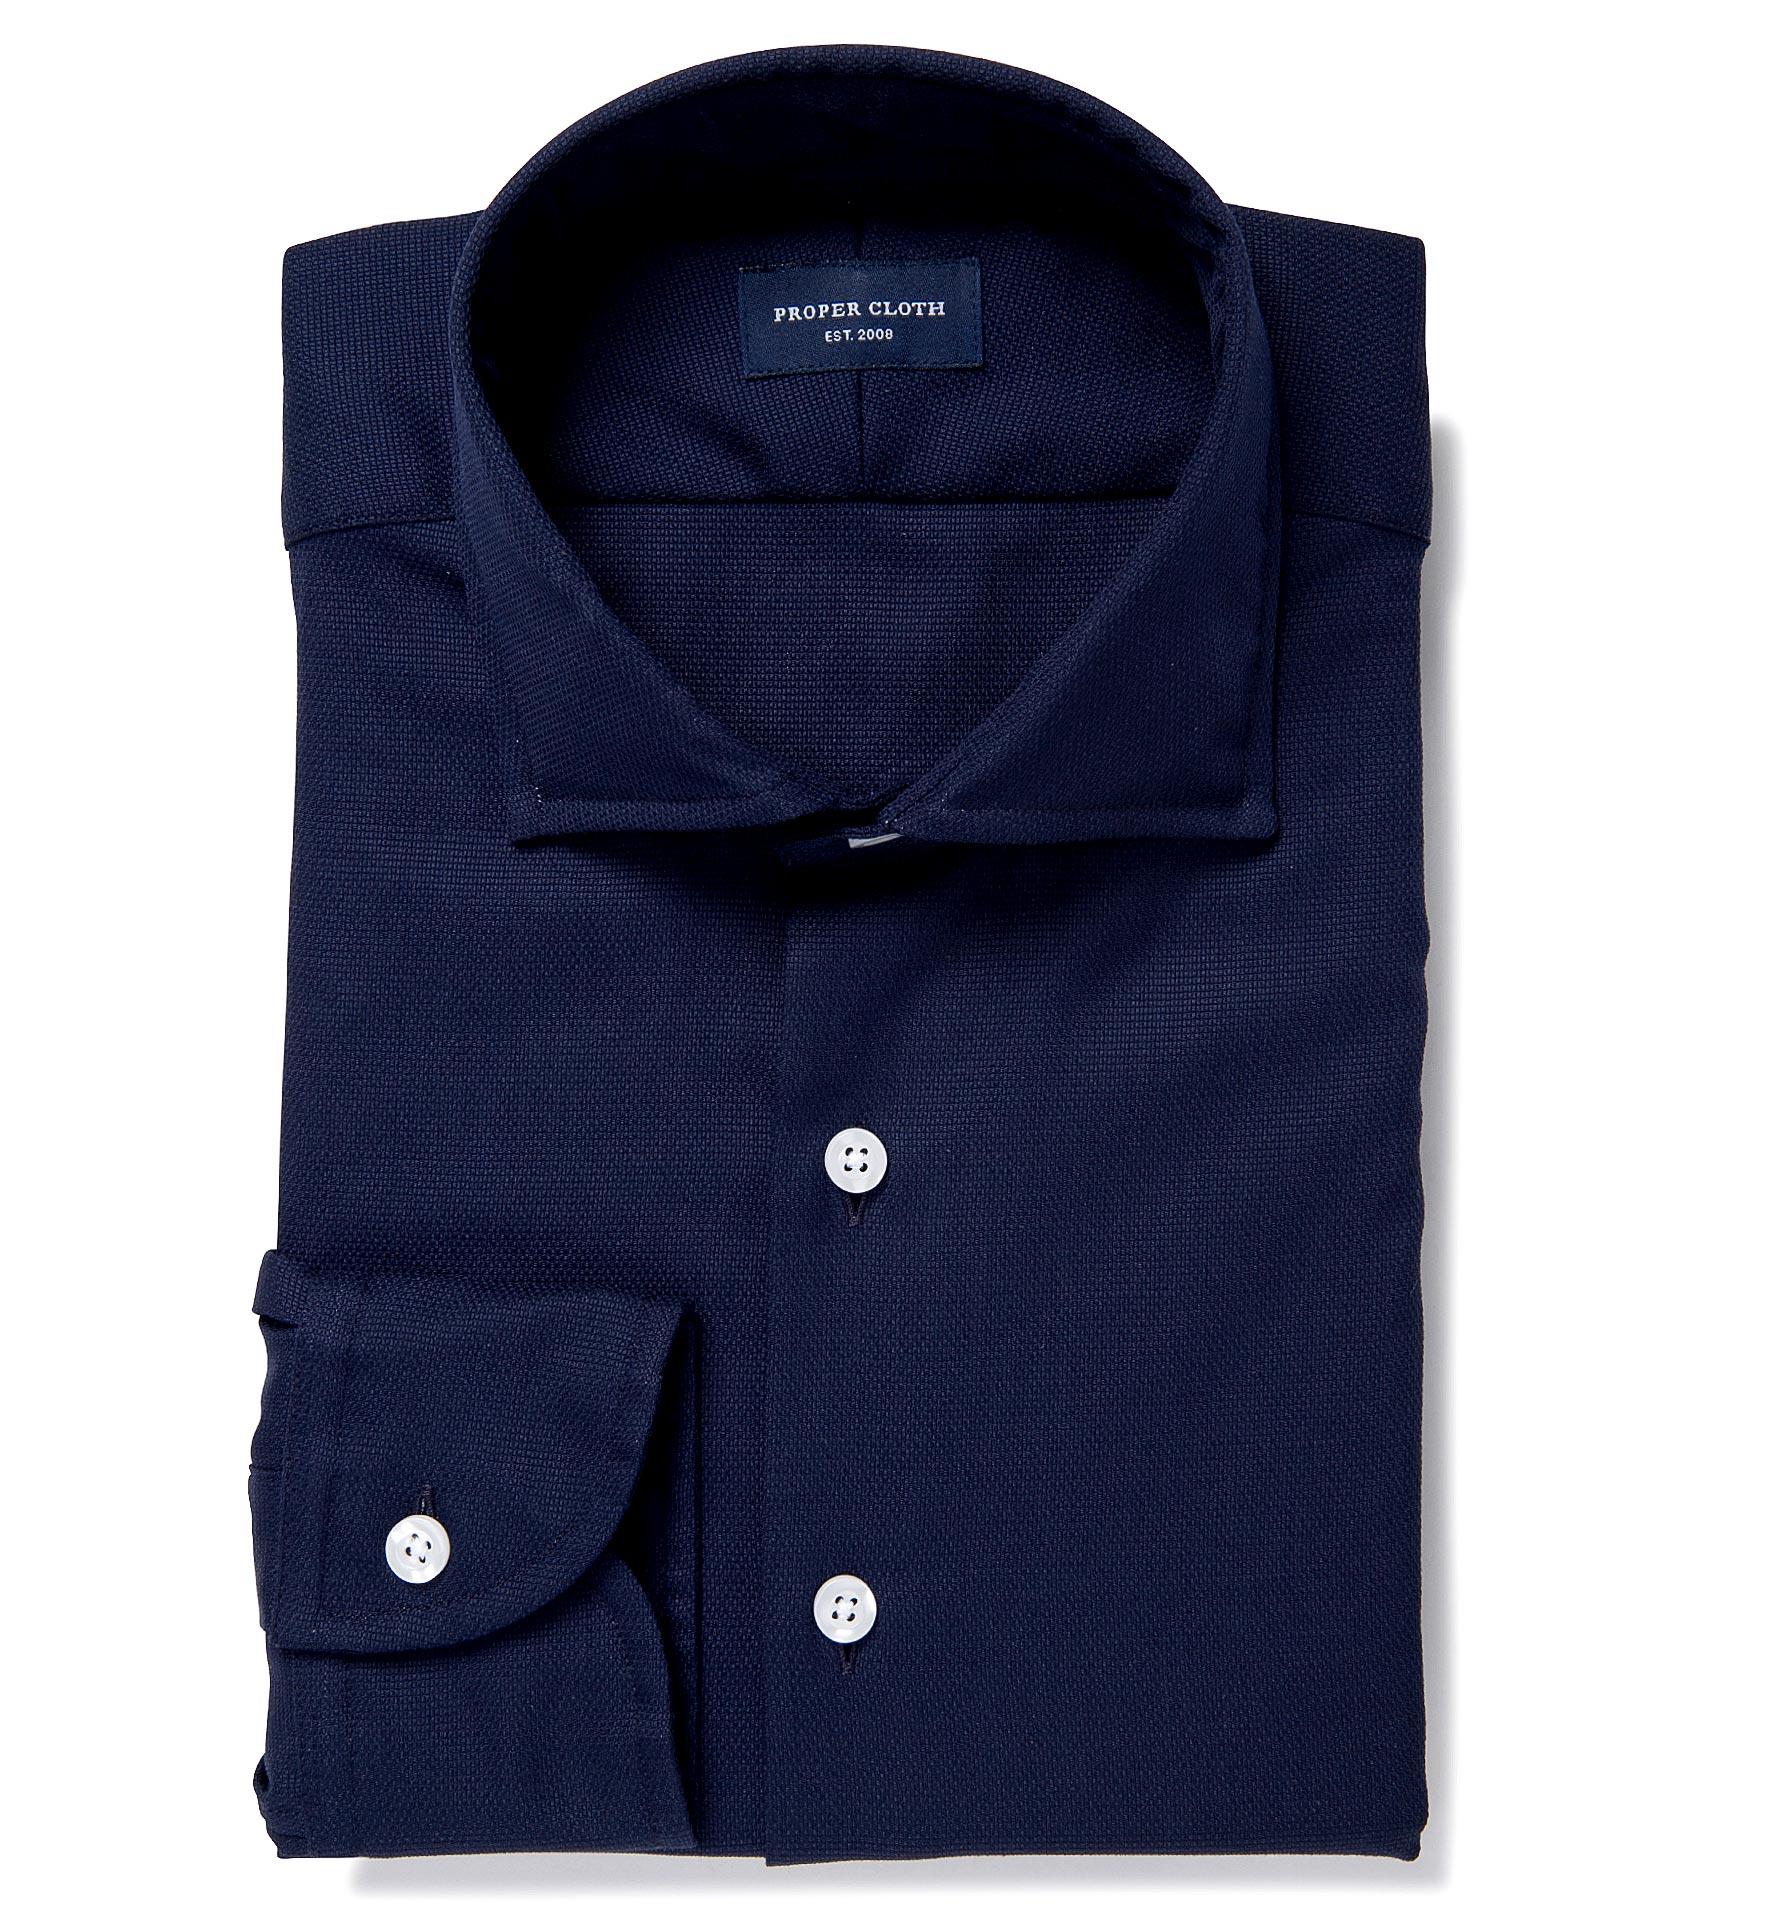 Thomas Mason Navy Woven Pique Dress Shirt By Proper Cloth